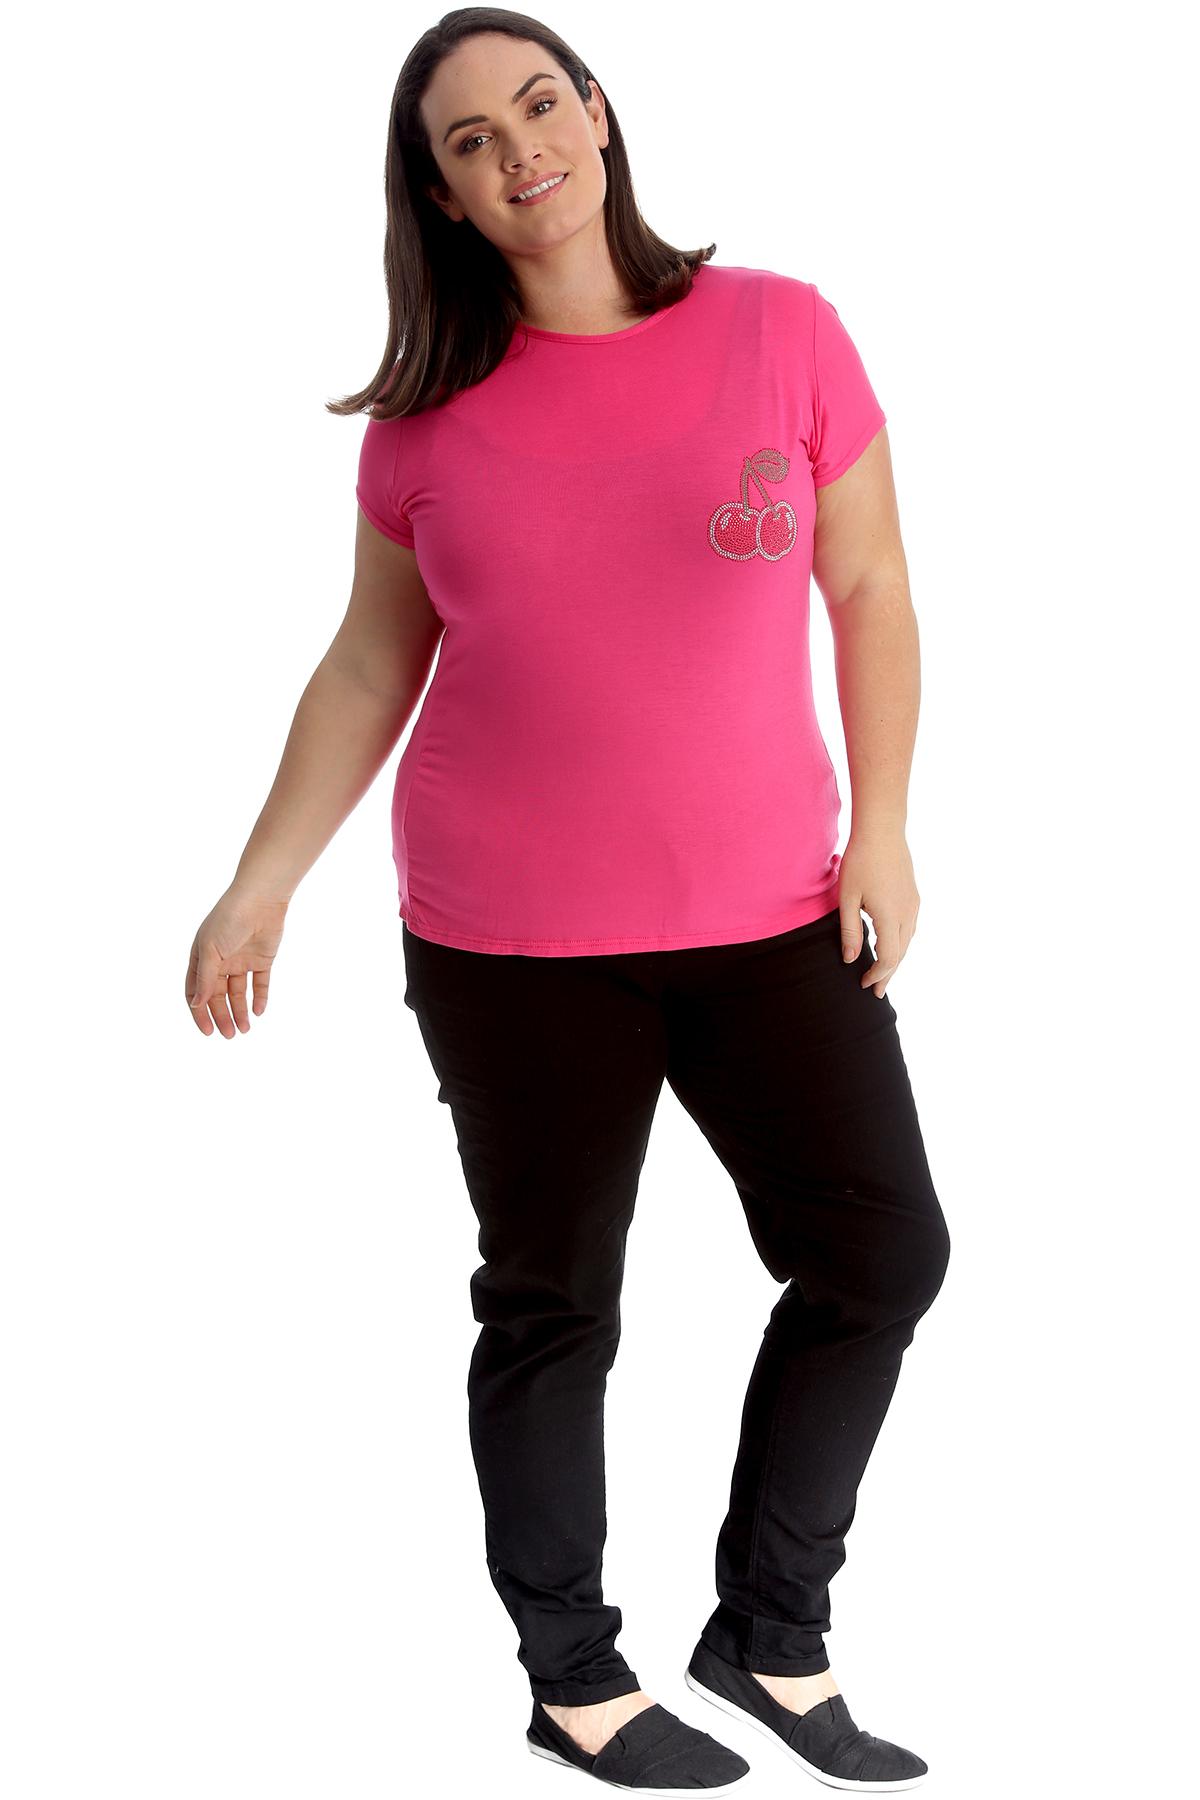 New-Womens-Plus-Size-Top-Ladies-Cherry-Rhinestone-T-Shirt-Soft-Stud-Shiny-Hip thumbnail 21